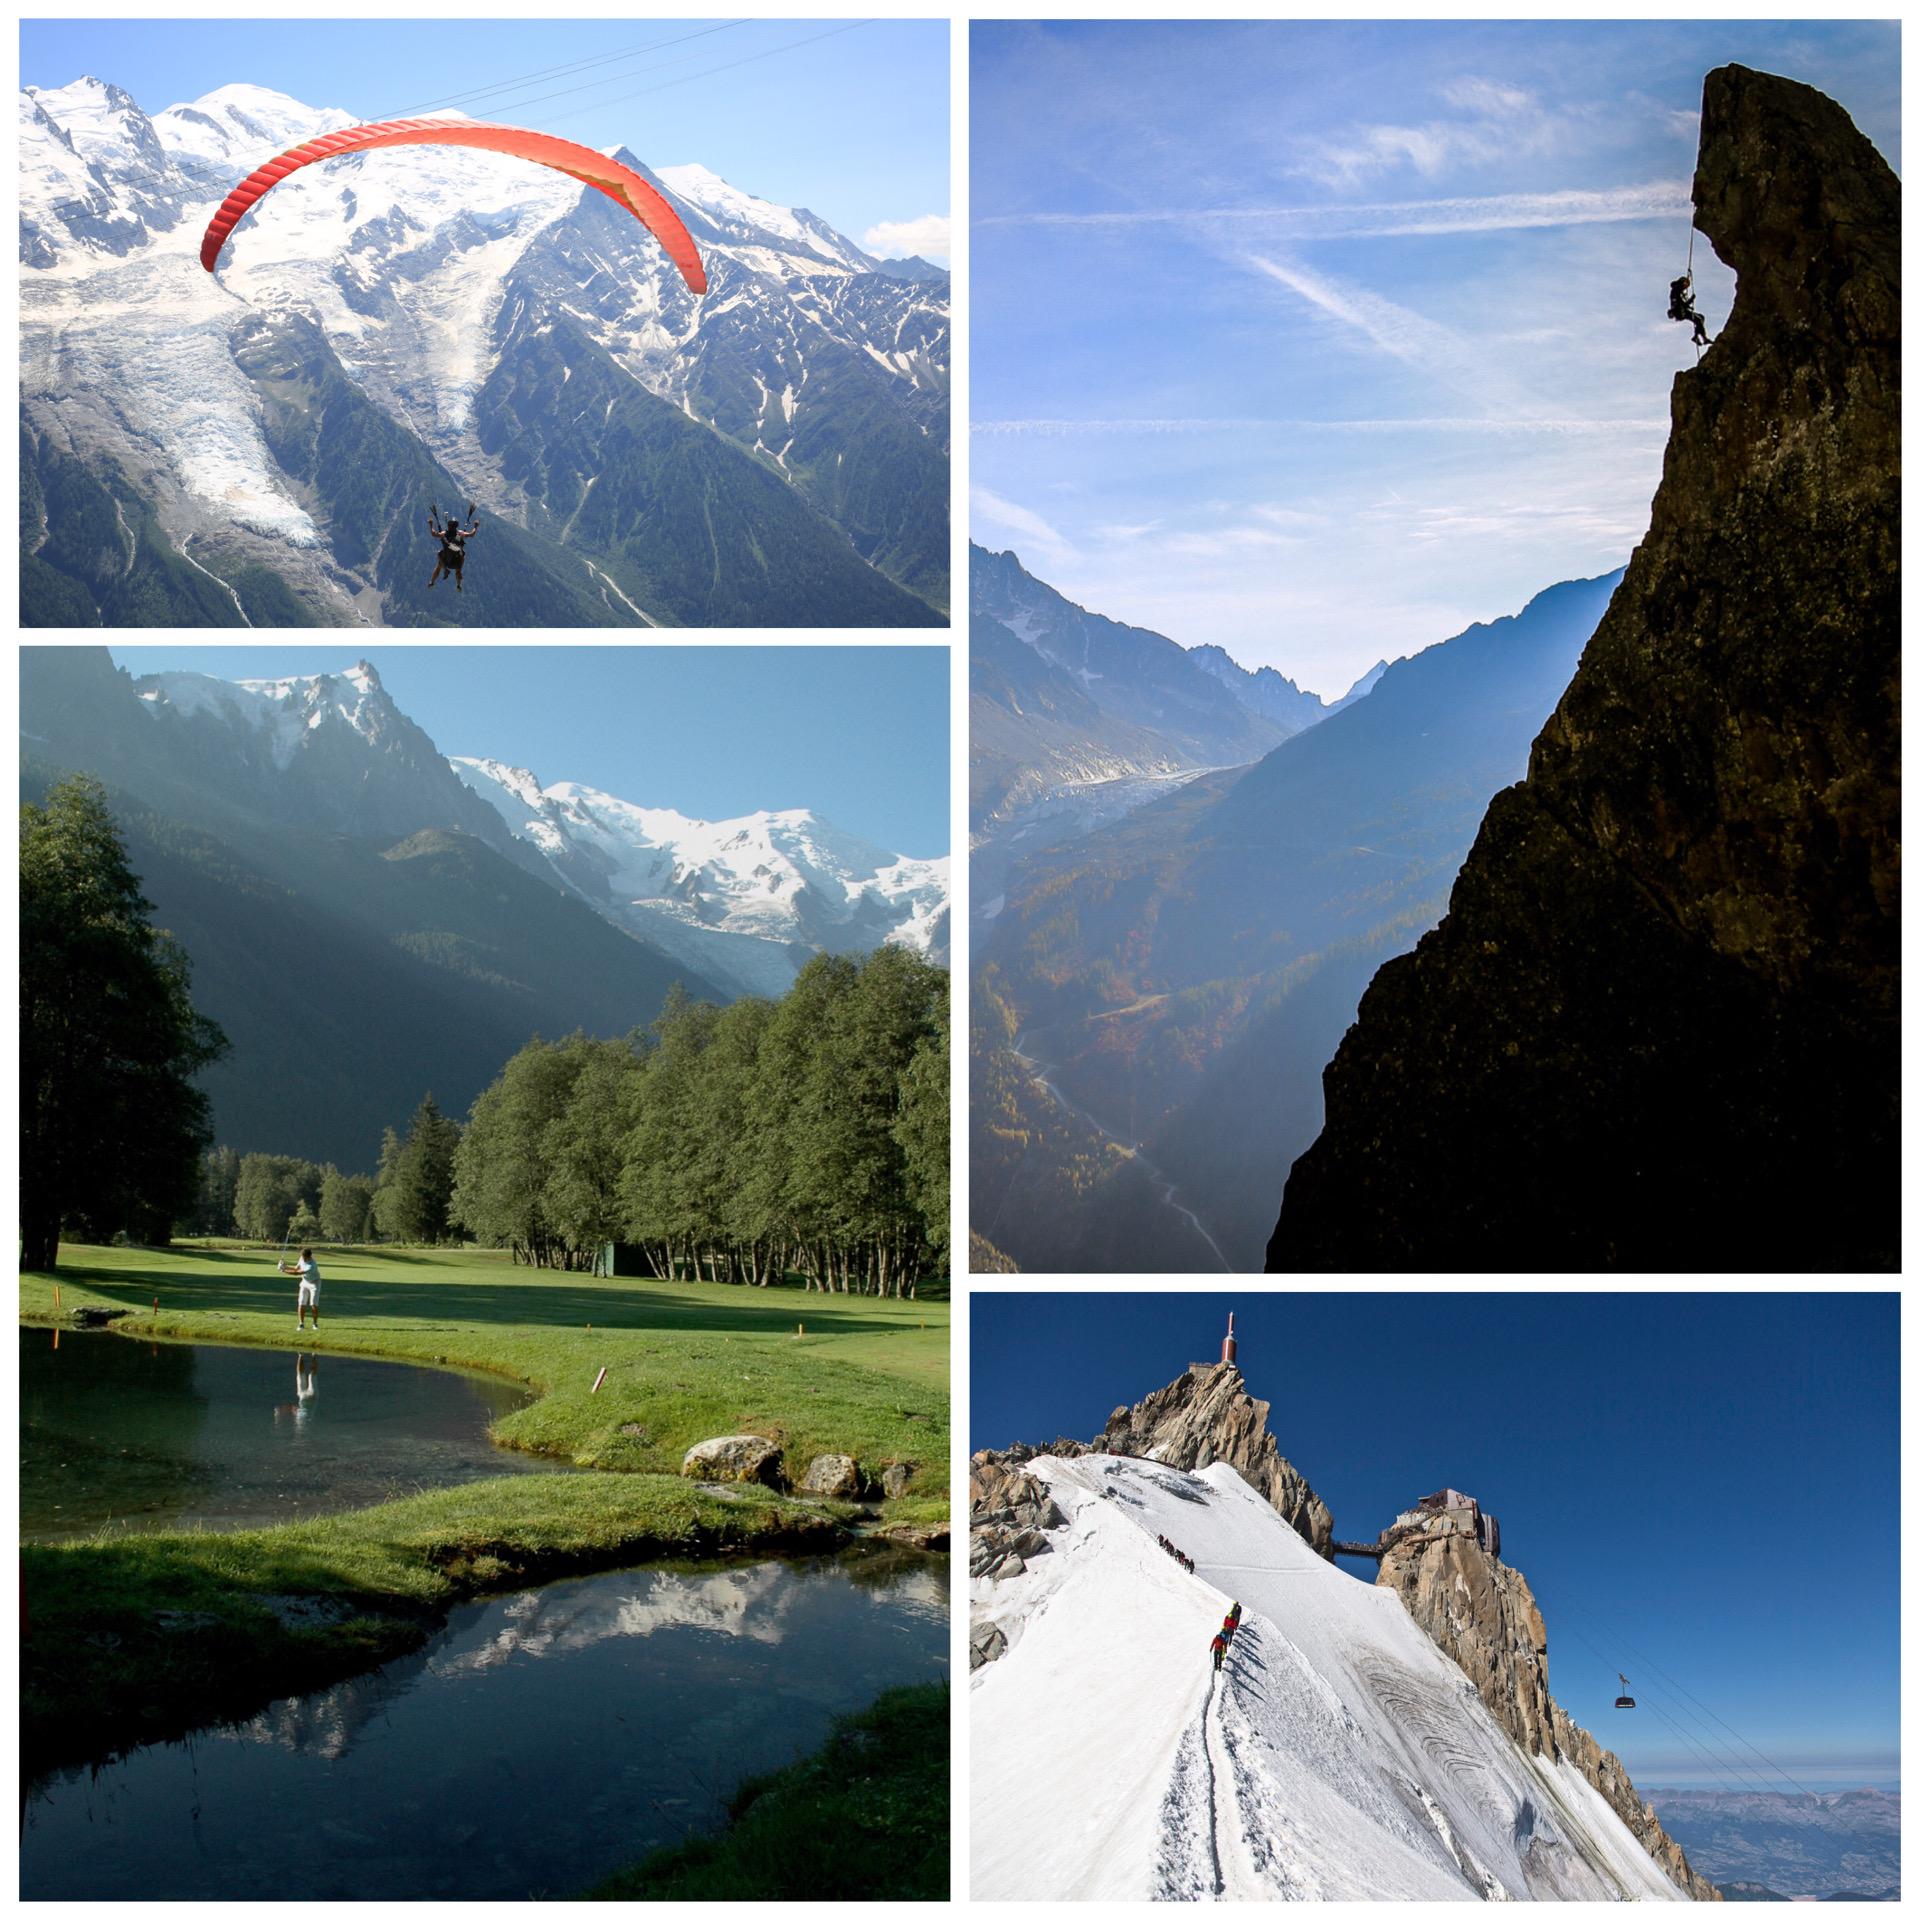 Chamonix, French Alps, summer activities